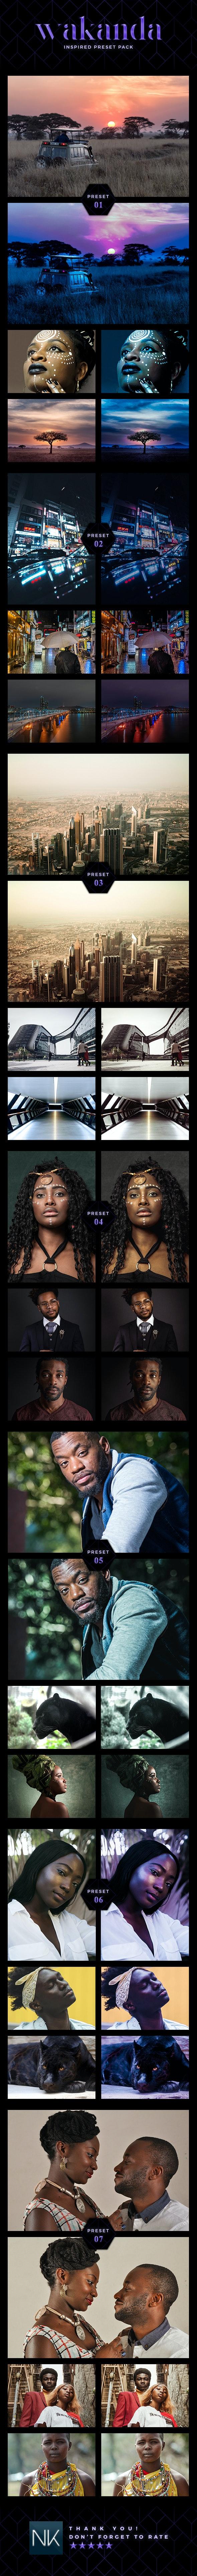 7 Cinematic Lightroom Presets - Wakanda Inspired Pack (+ Mobile Version) - Lightroom Presets Add-ons